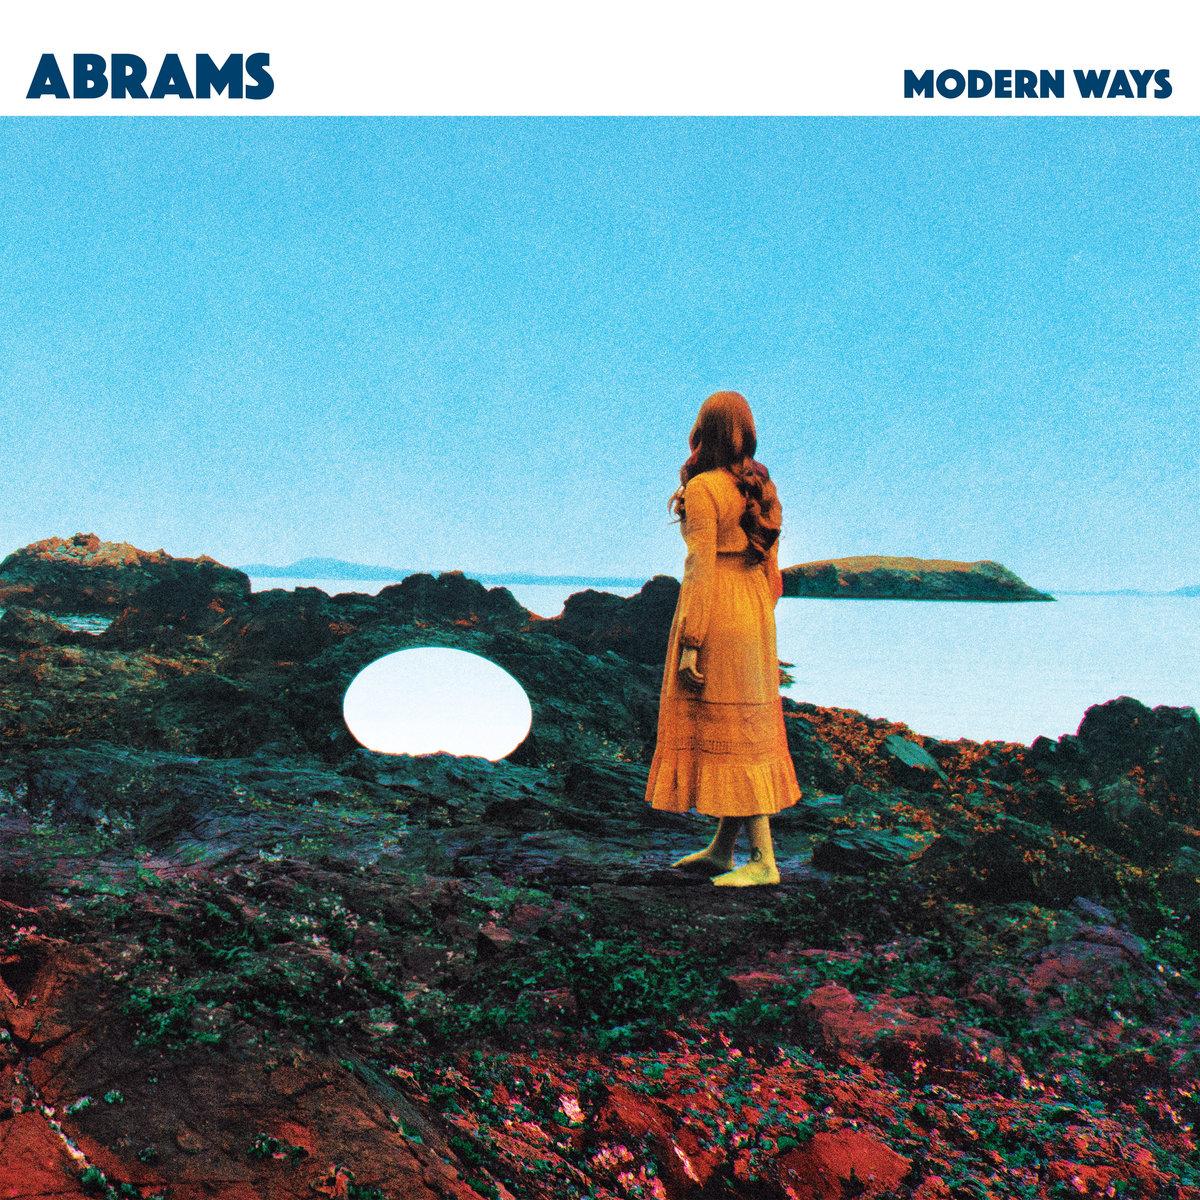 abrams modern ways